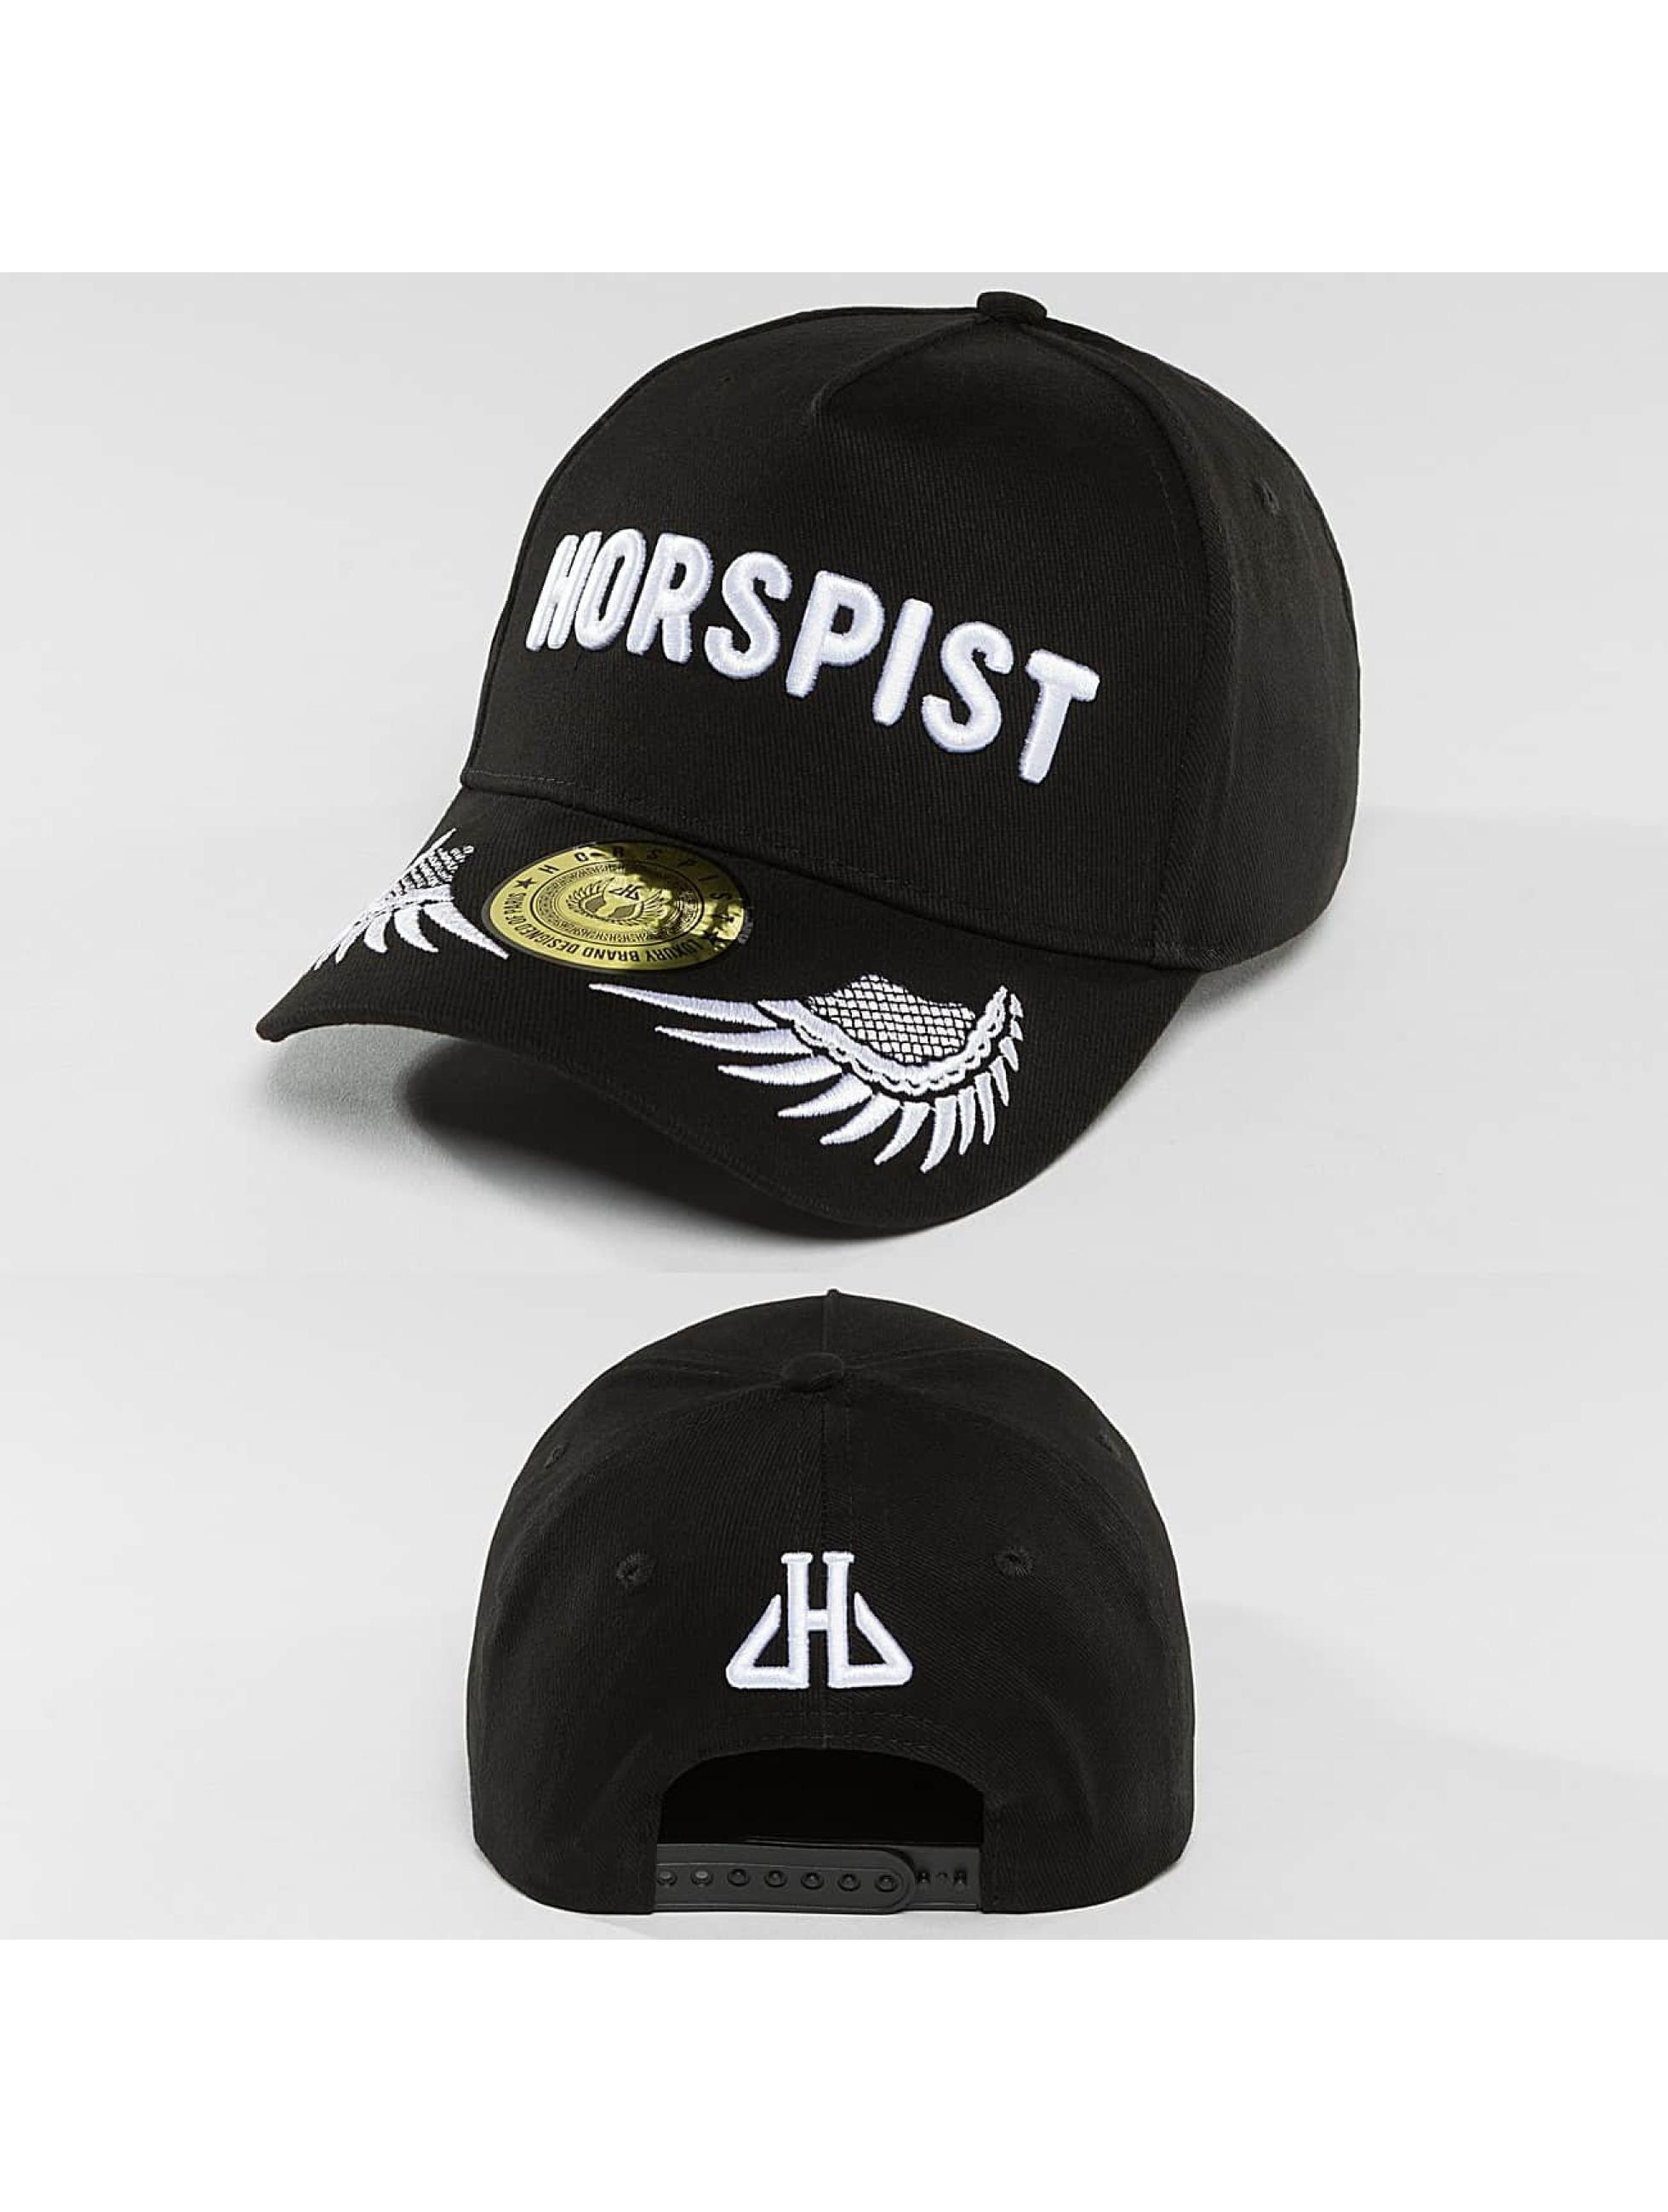 Horspist Snapback Caps Remenber sort